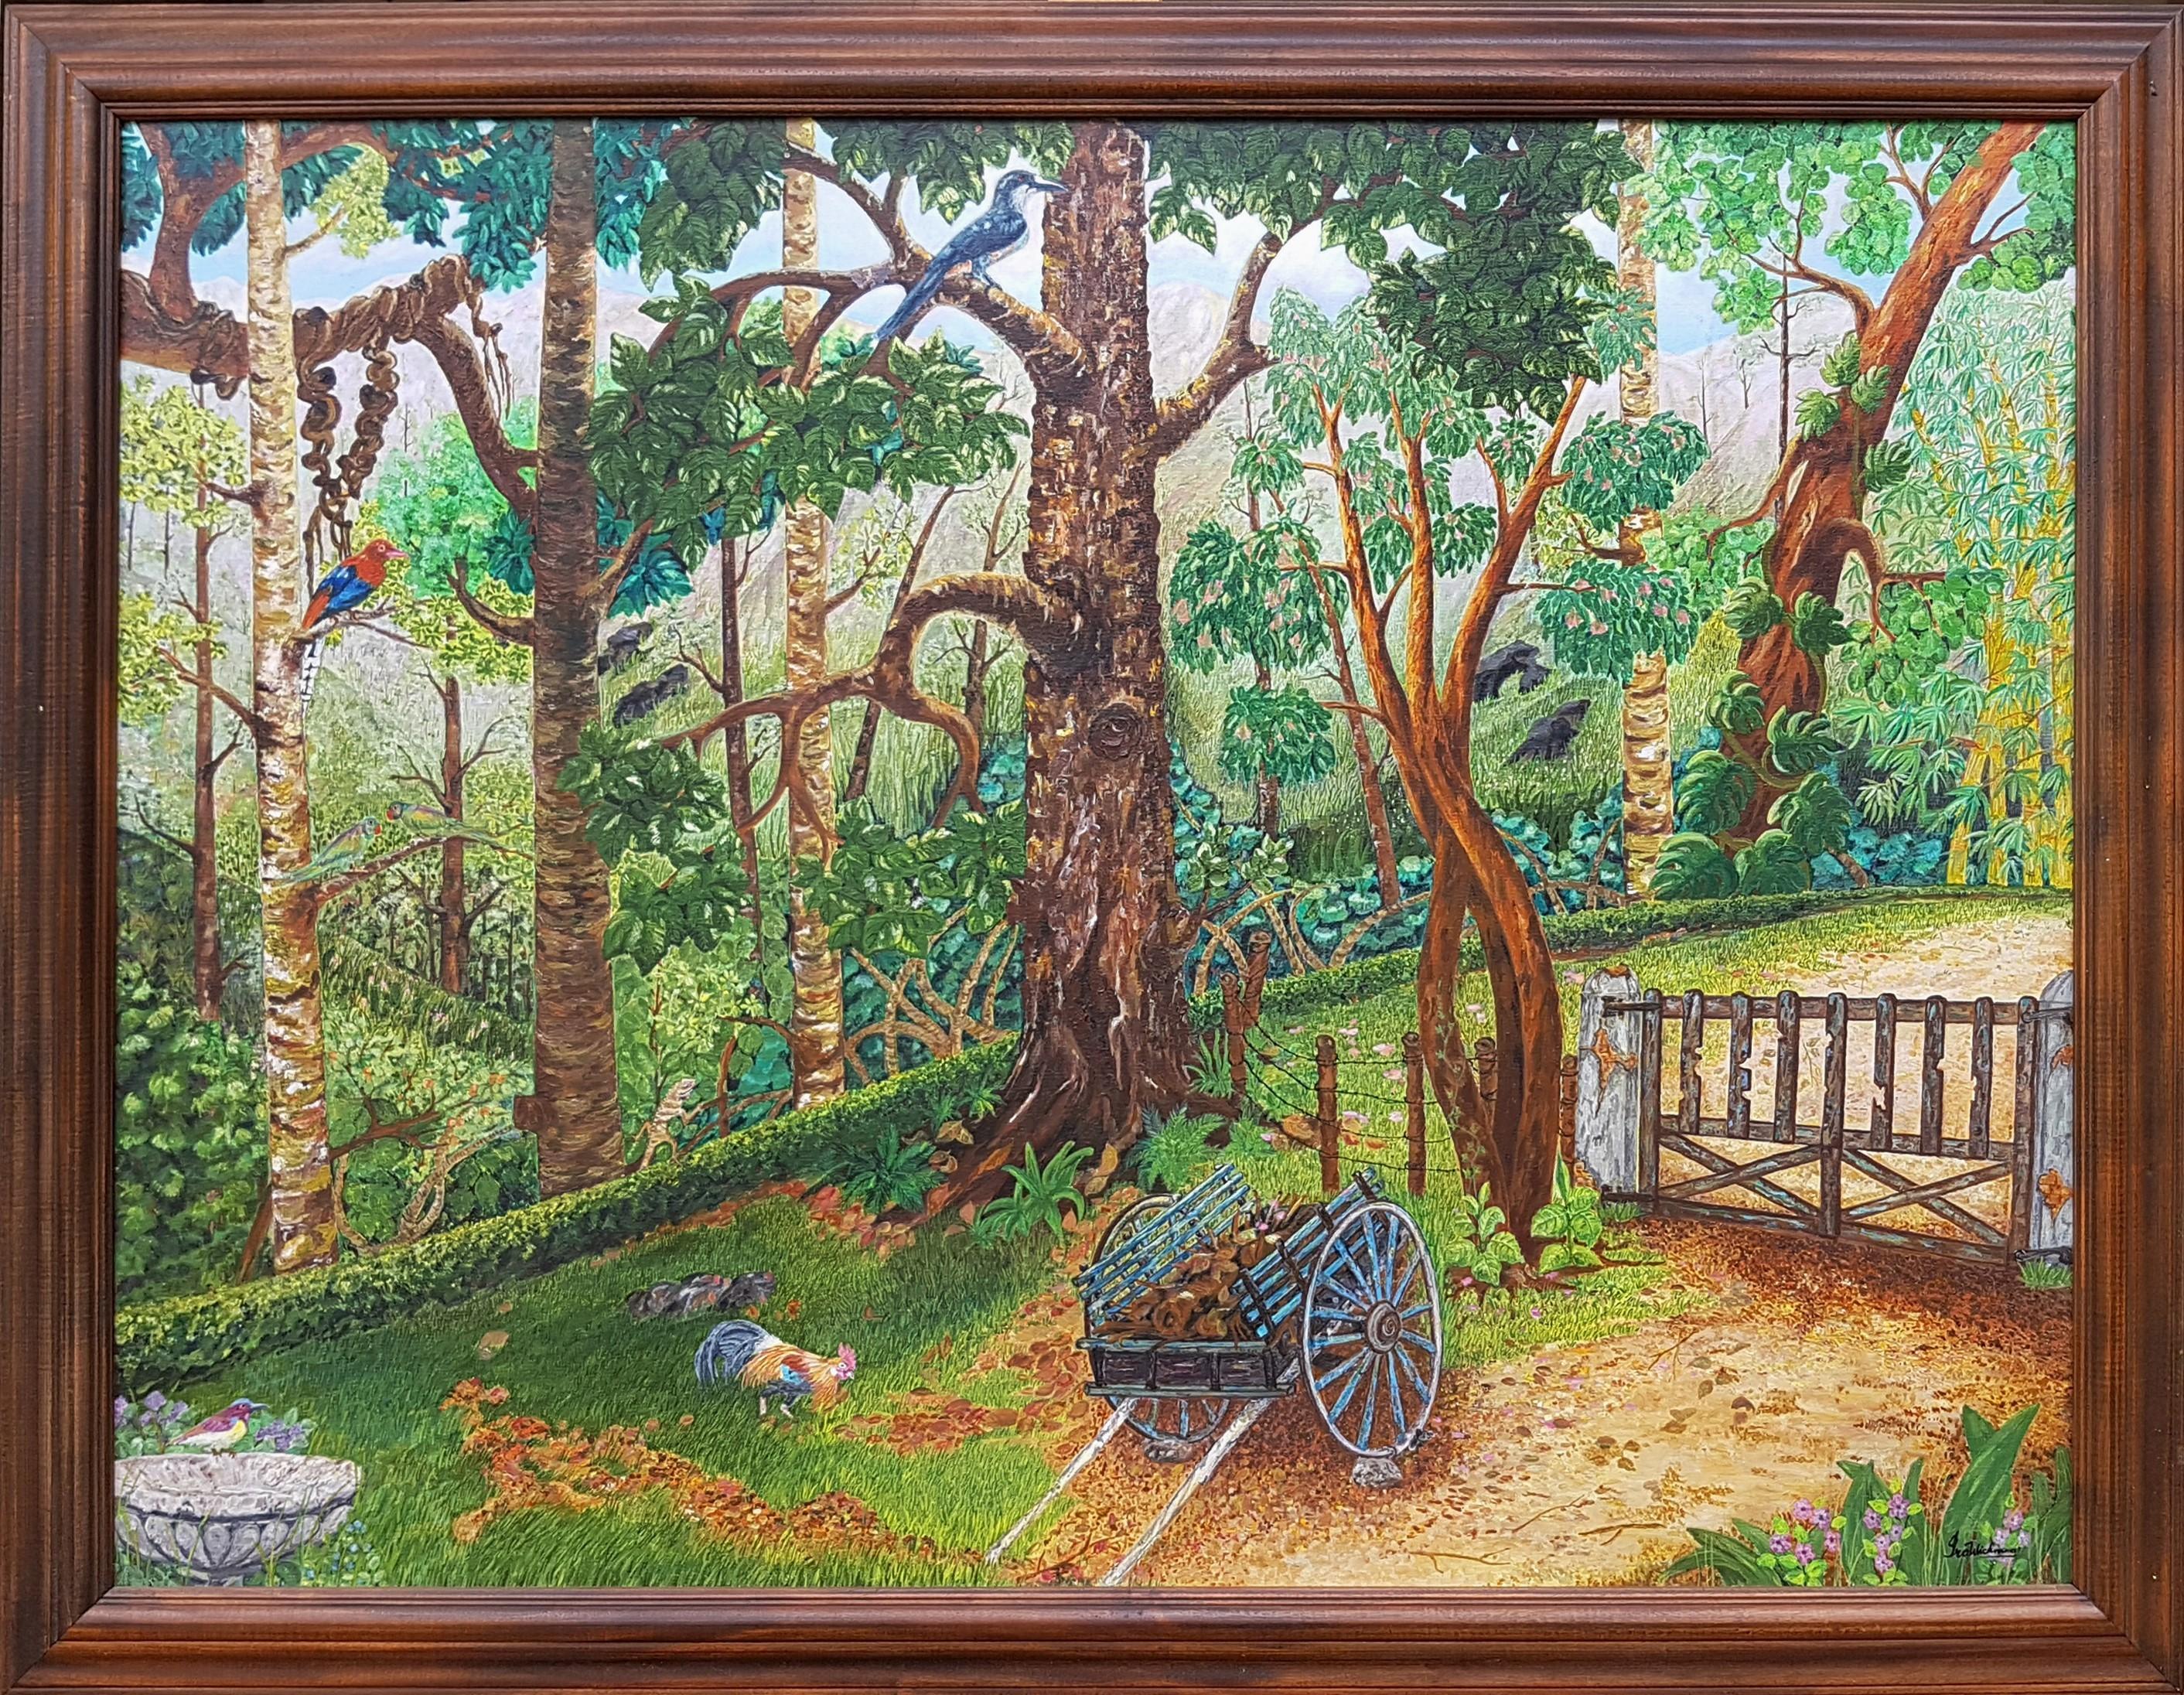 Bungalow backyard by Iranganie Wickramasinghe